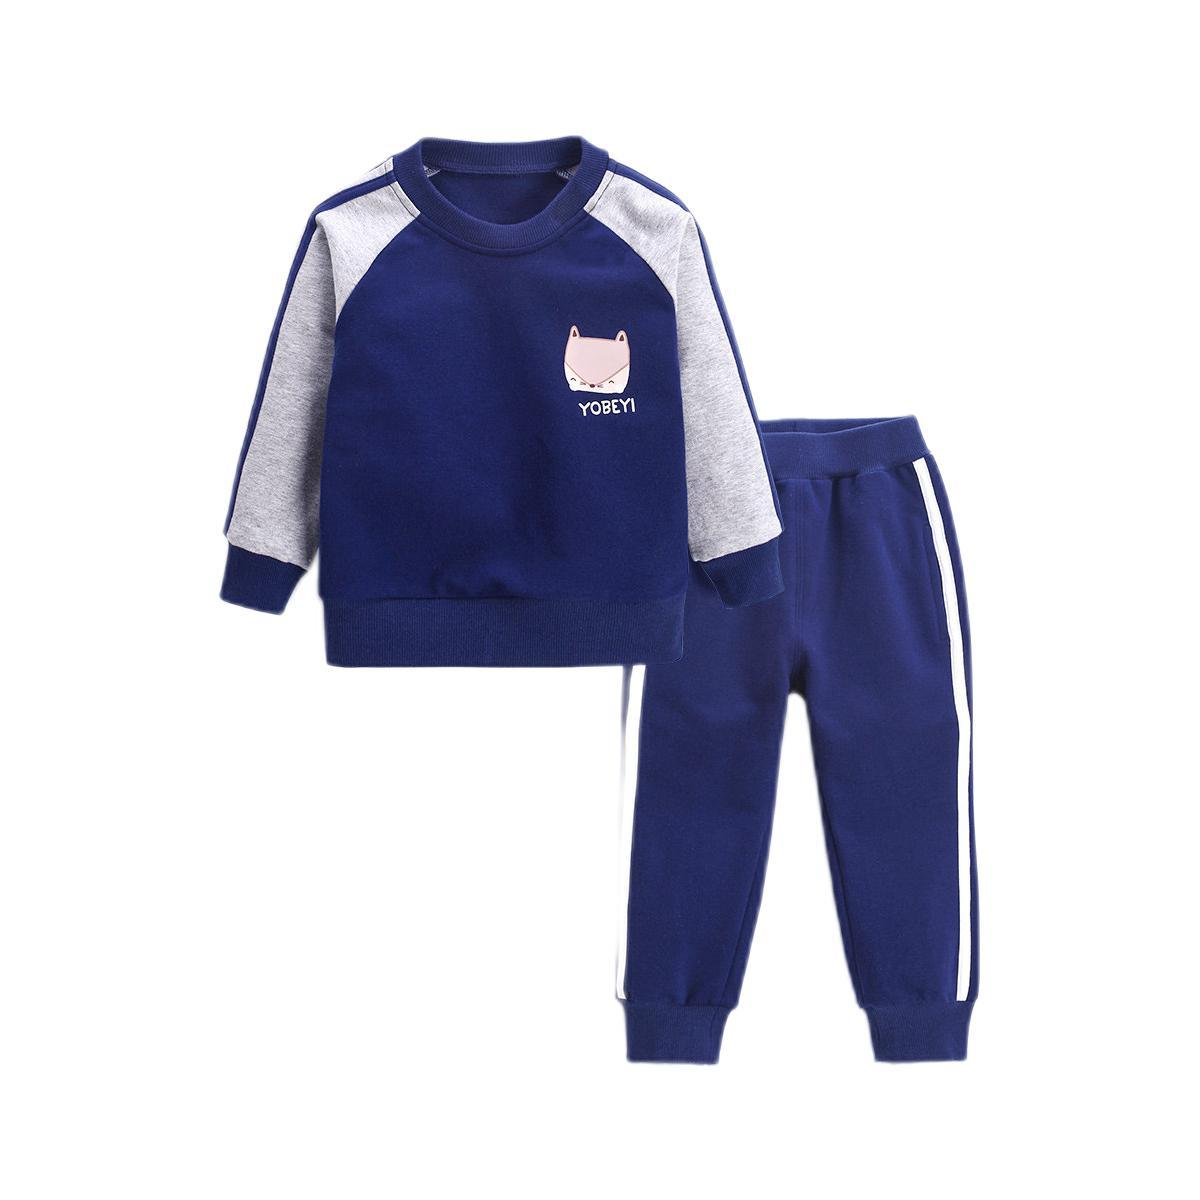 Yobeyi 优贝宜 82602 儿童卫衣套装